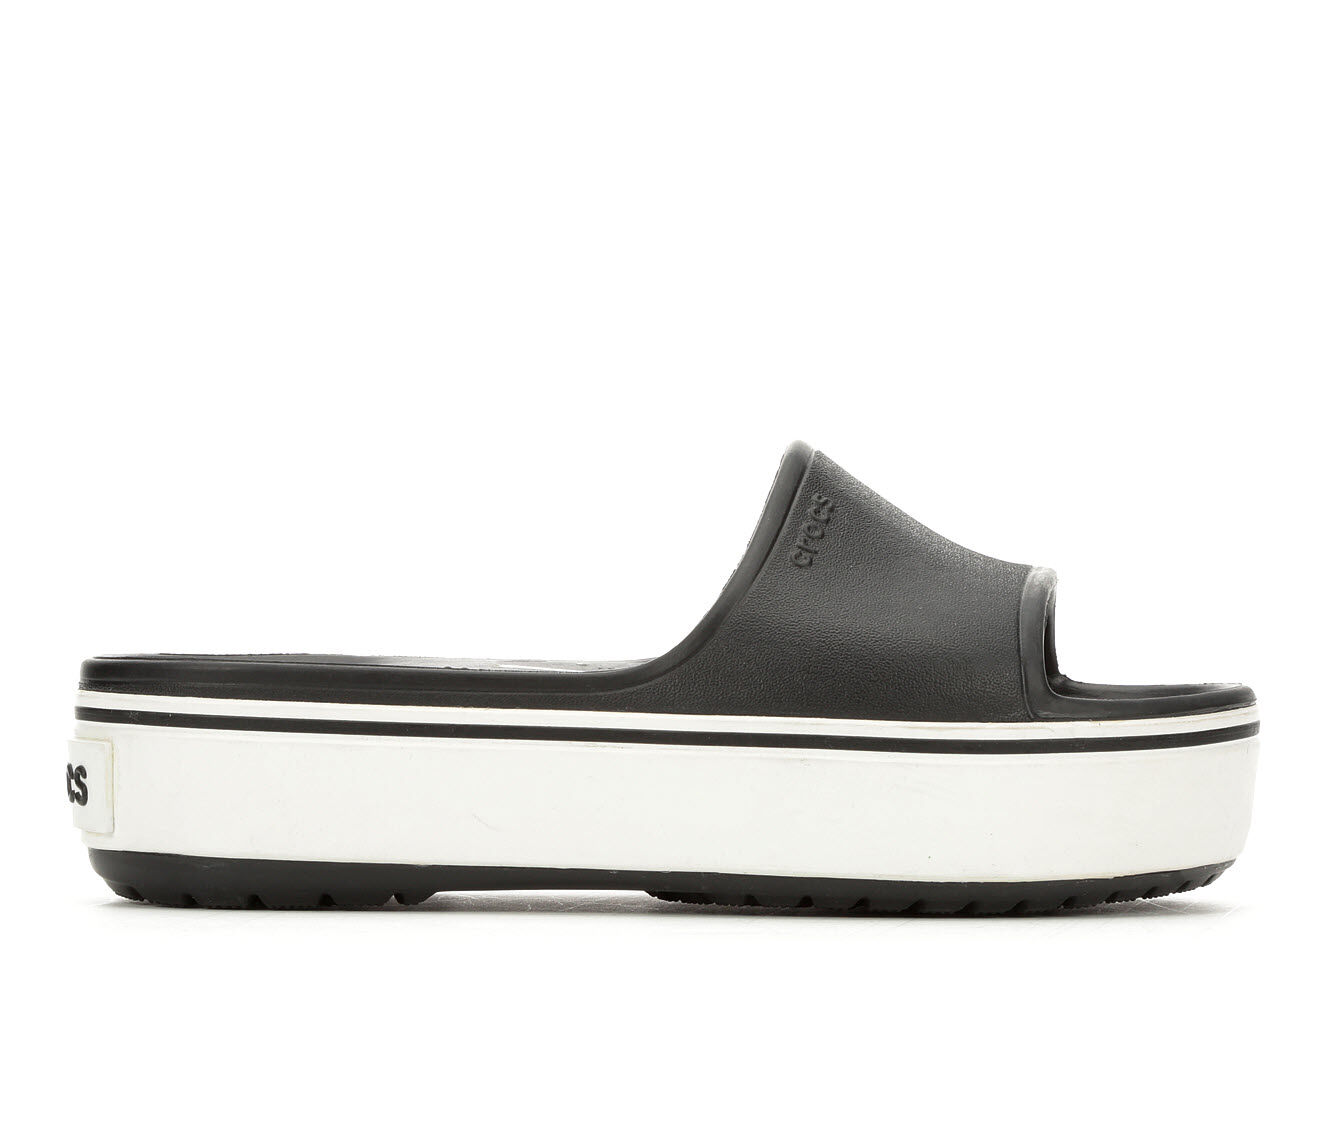 Women's Crocs Crocband Platform Sl Flatform Slides Black/White